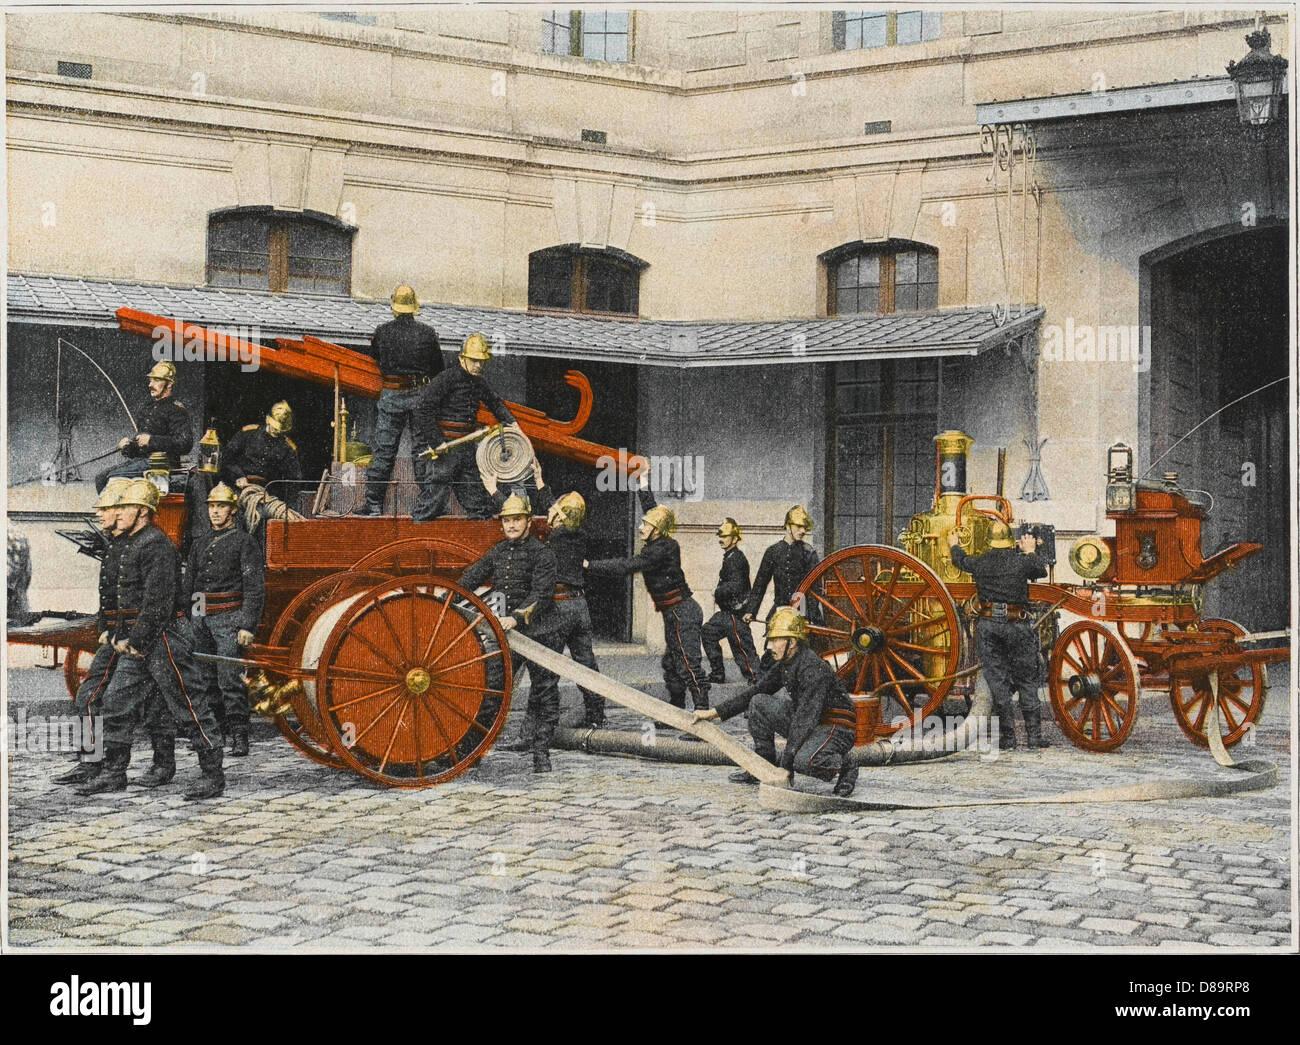 Sapeurs Pompiers Engine - Stock Image